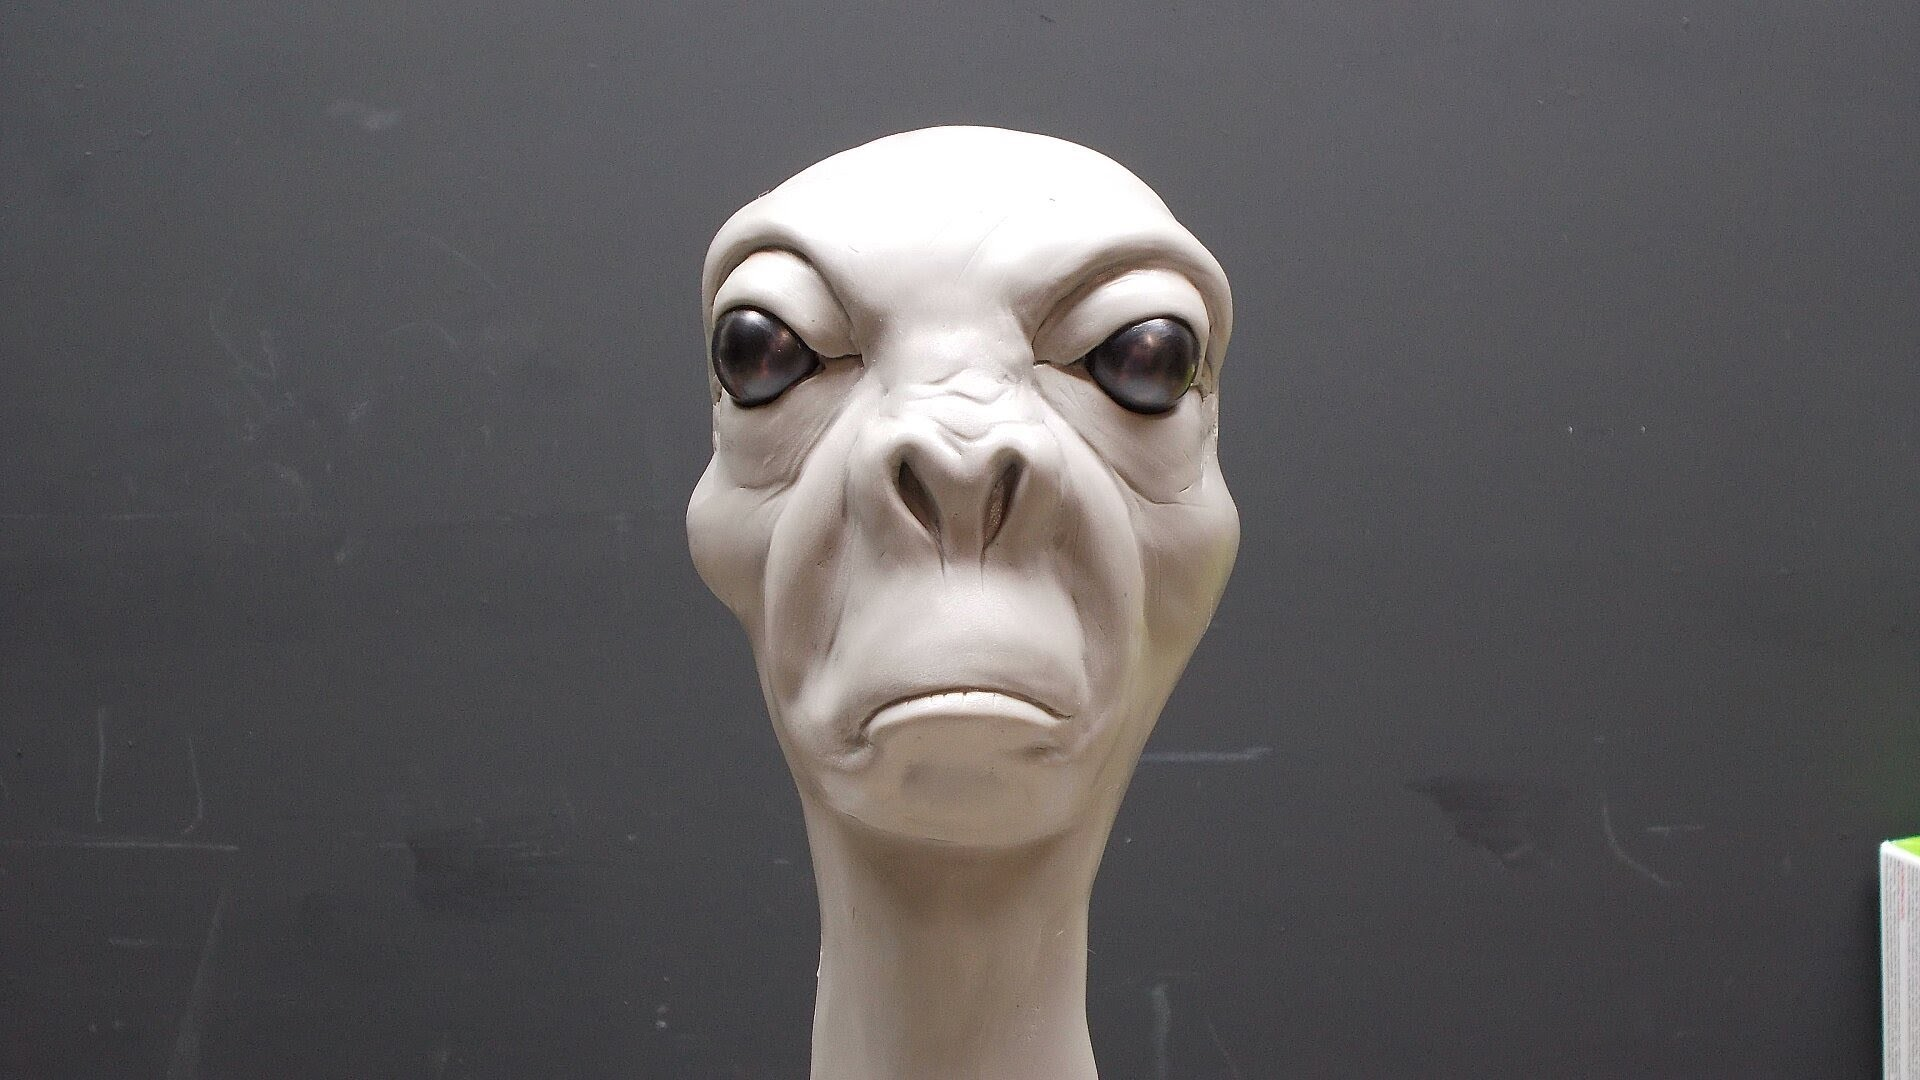 Grumpy Alien, Part 1.